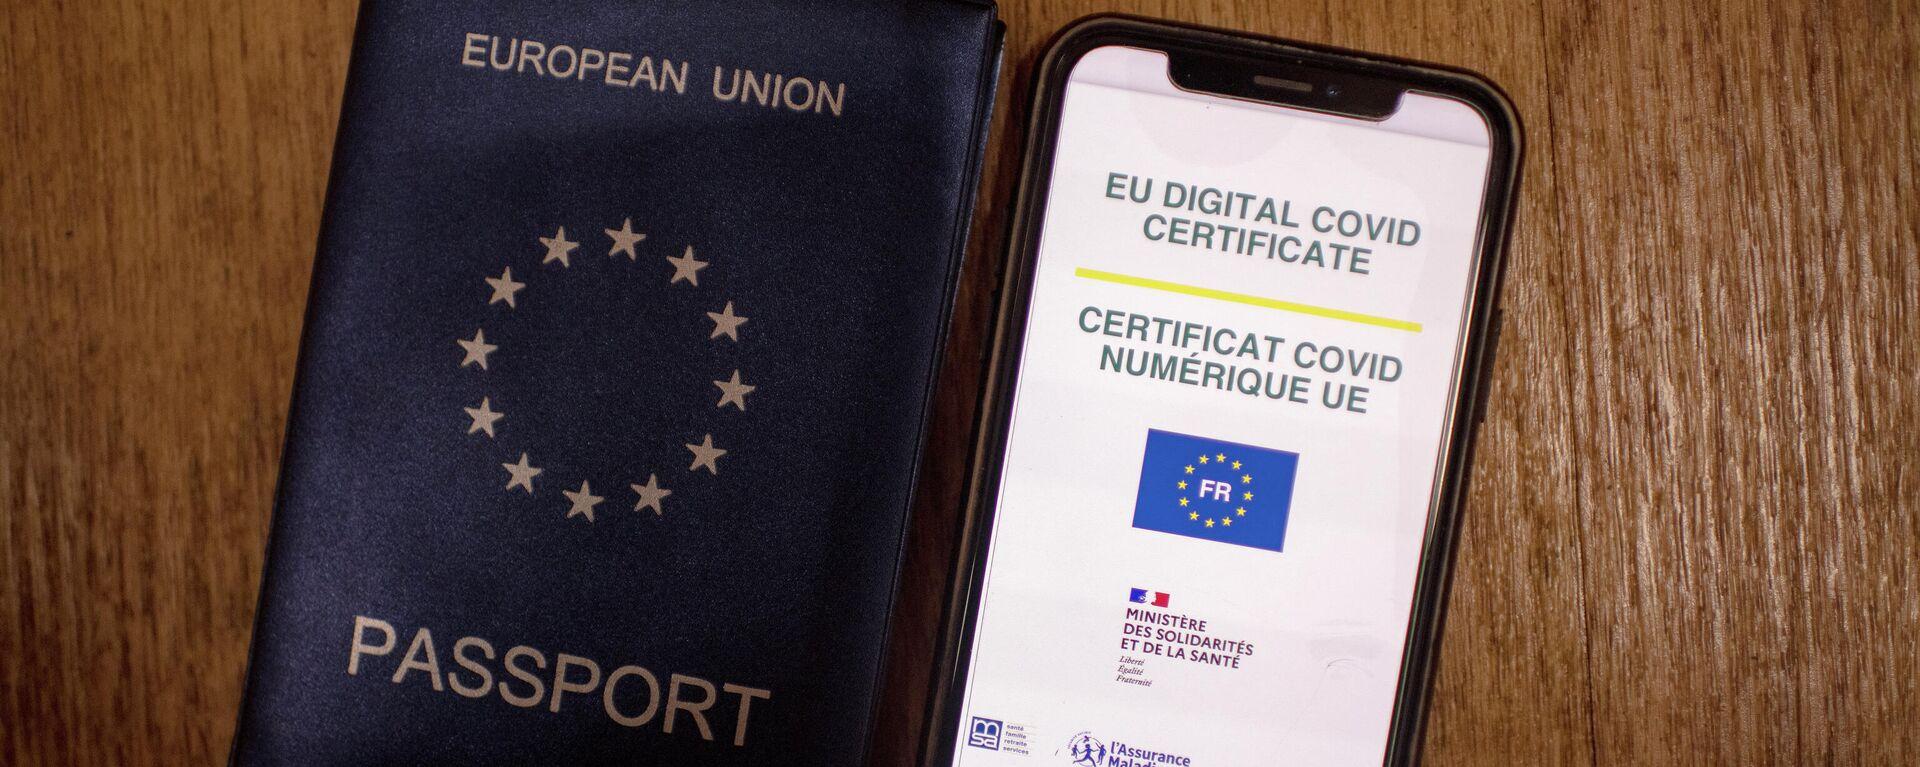 certificado COVID digital en la Unión Europea (UE) - Sputnik Mundo, 1920, 28.07.2021